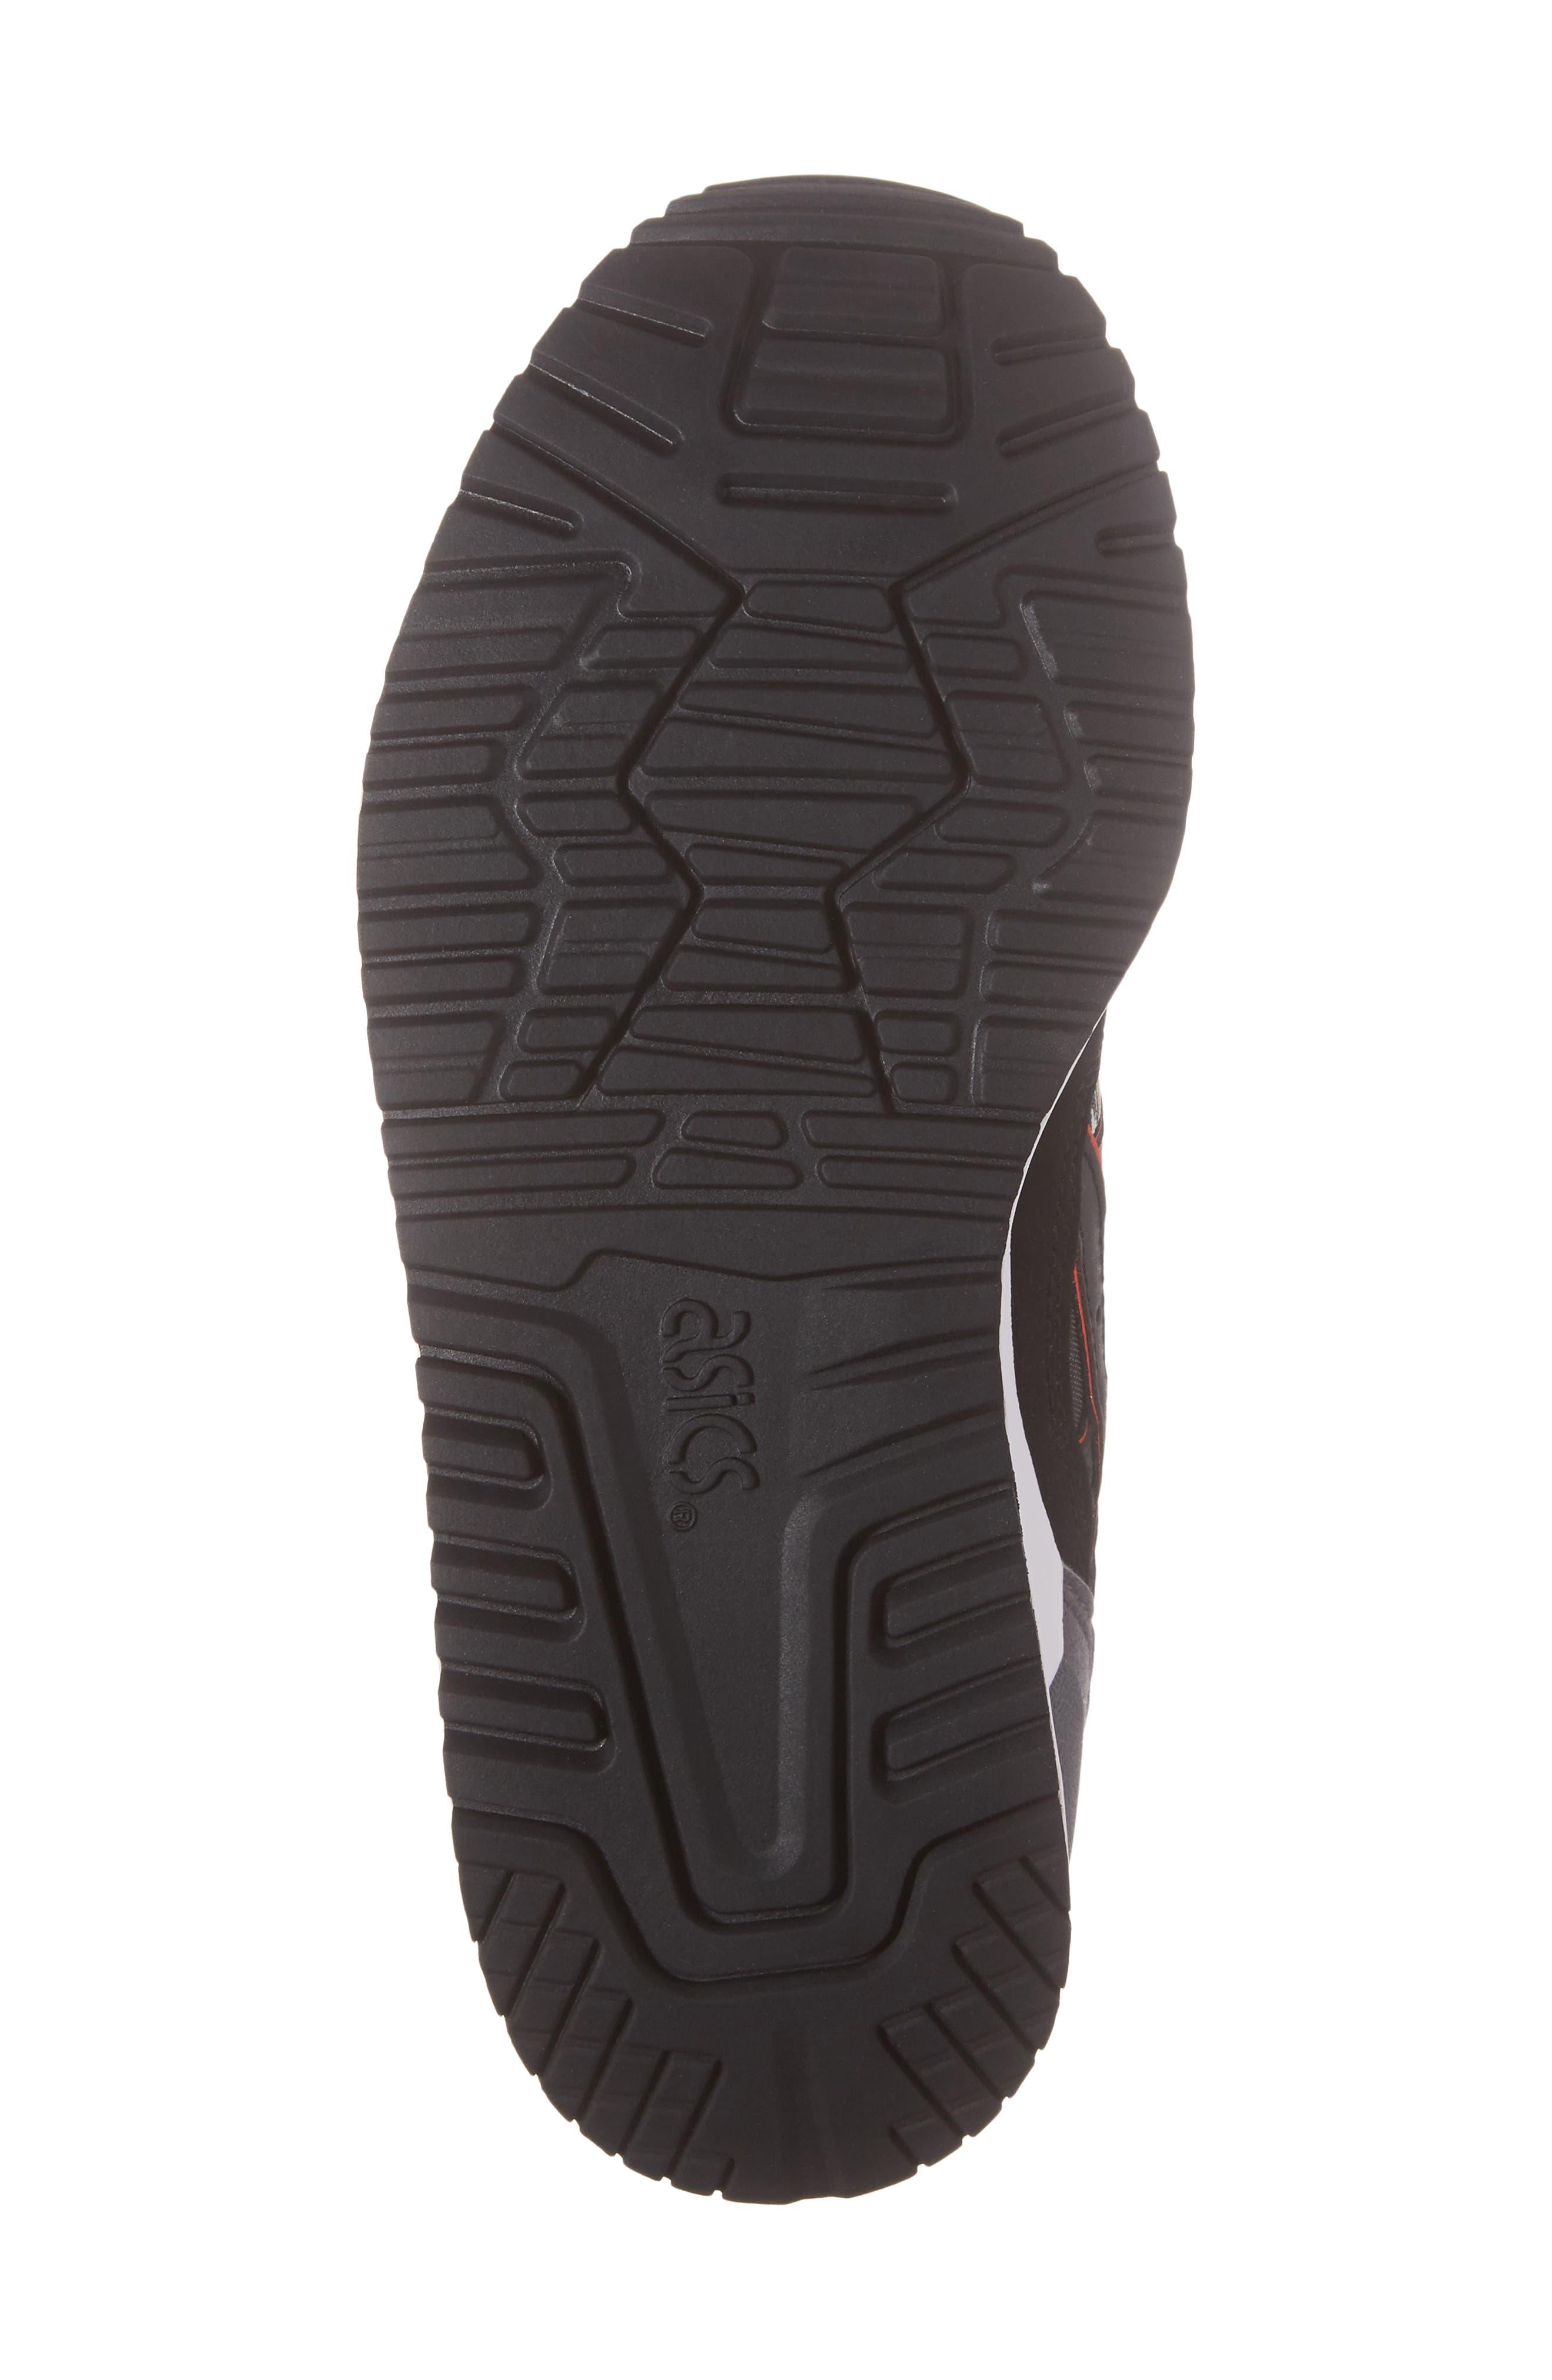 GEL-LYTE<sup>®</sup> III PS Slip-On Sneaker,                             Alternate thumbnail 6, color,                             001